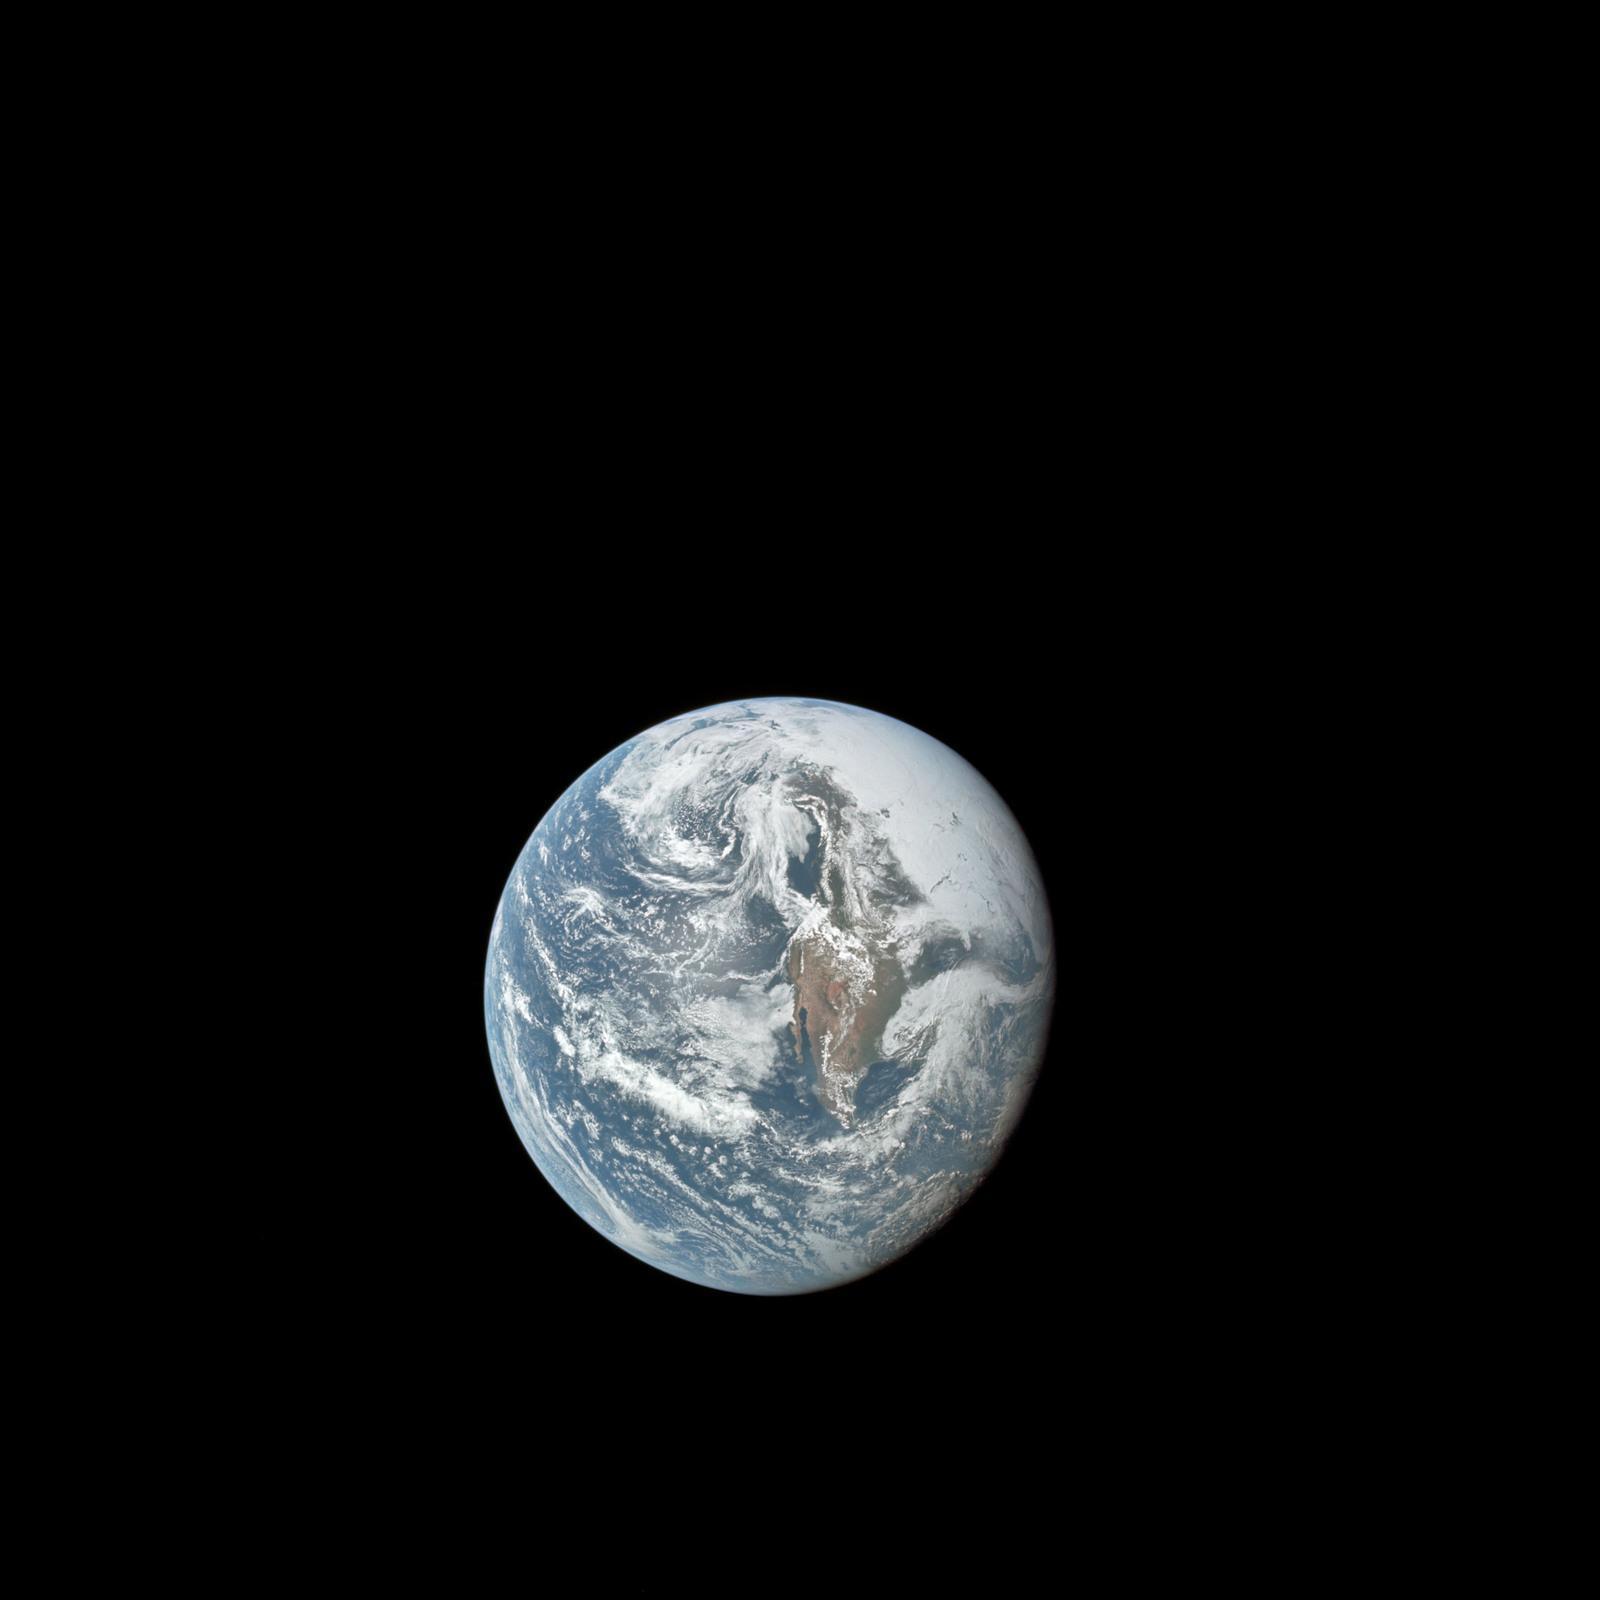 AS10-34-5013 - Apollo 10 - Apollo 10 Mission image - Earth view from 36, 000 nautical miles